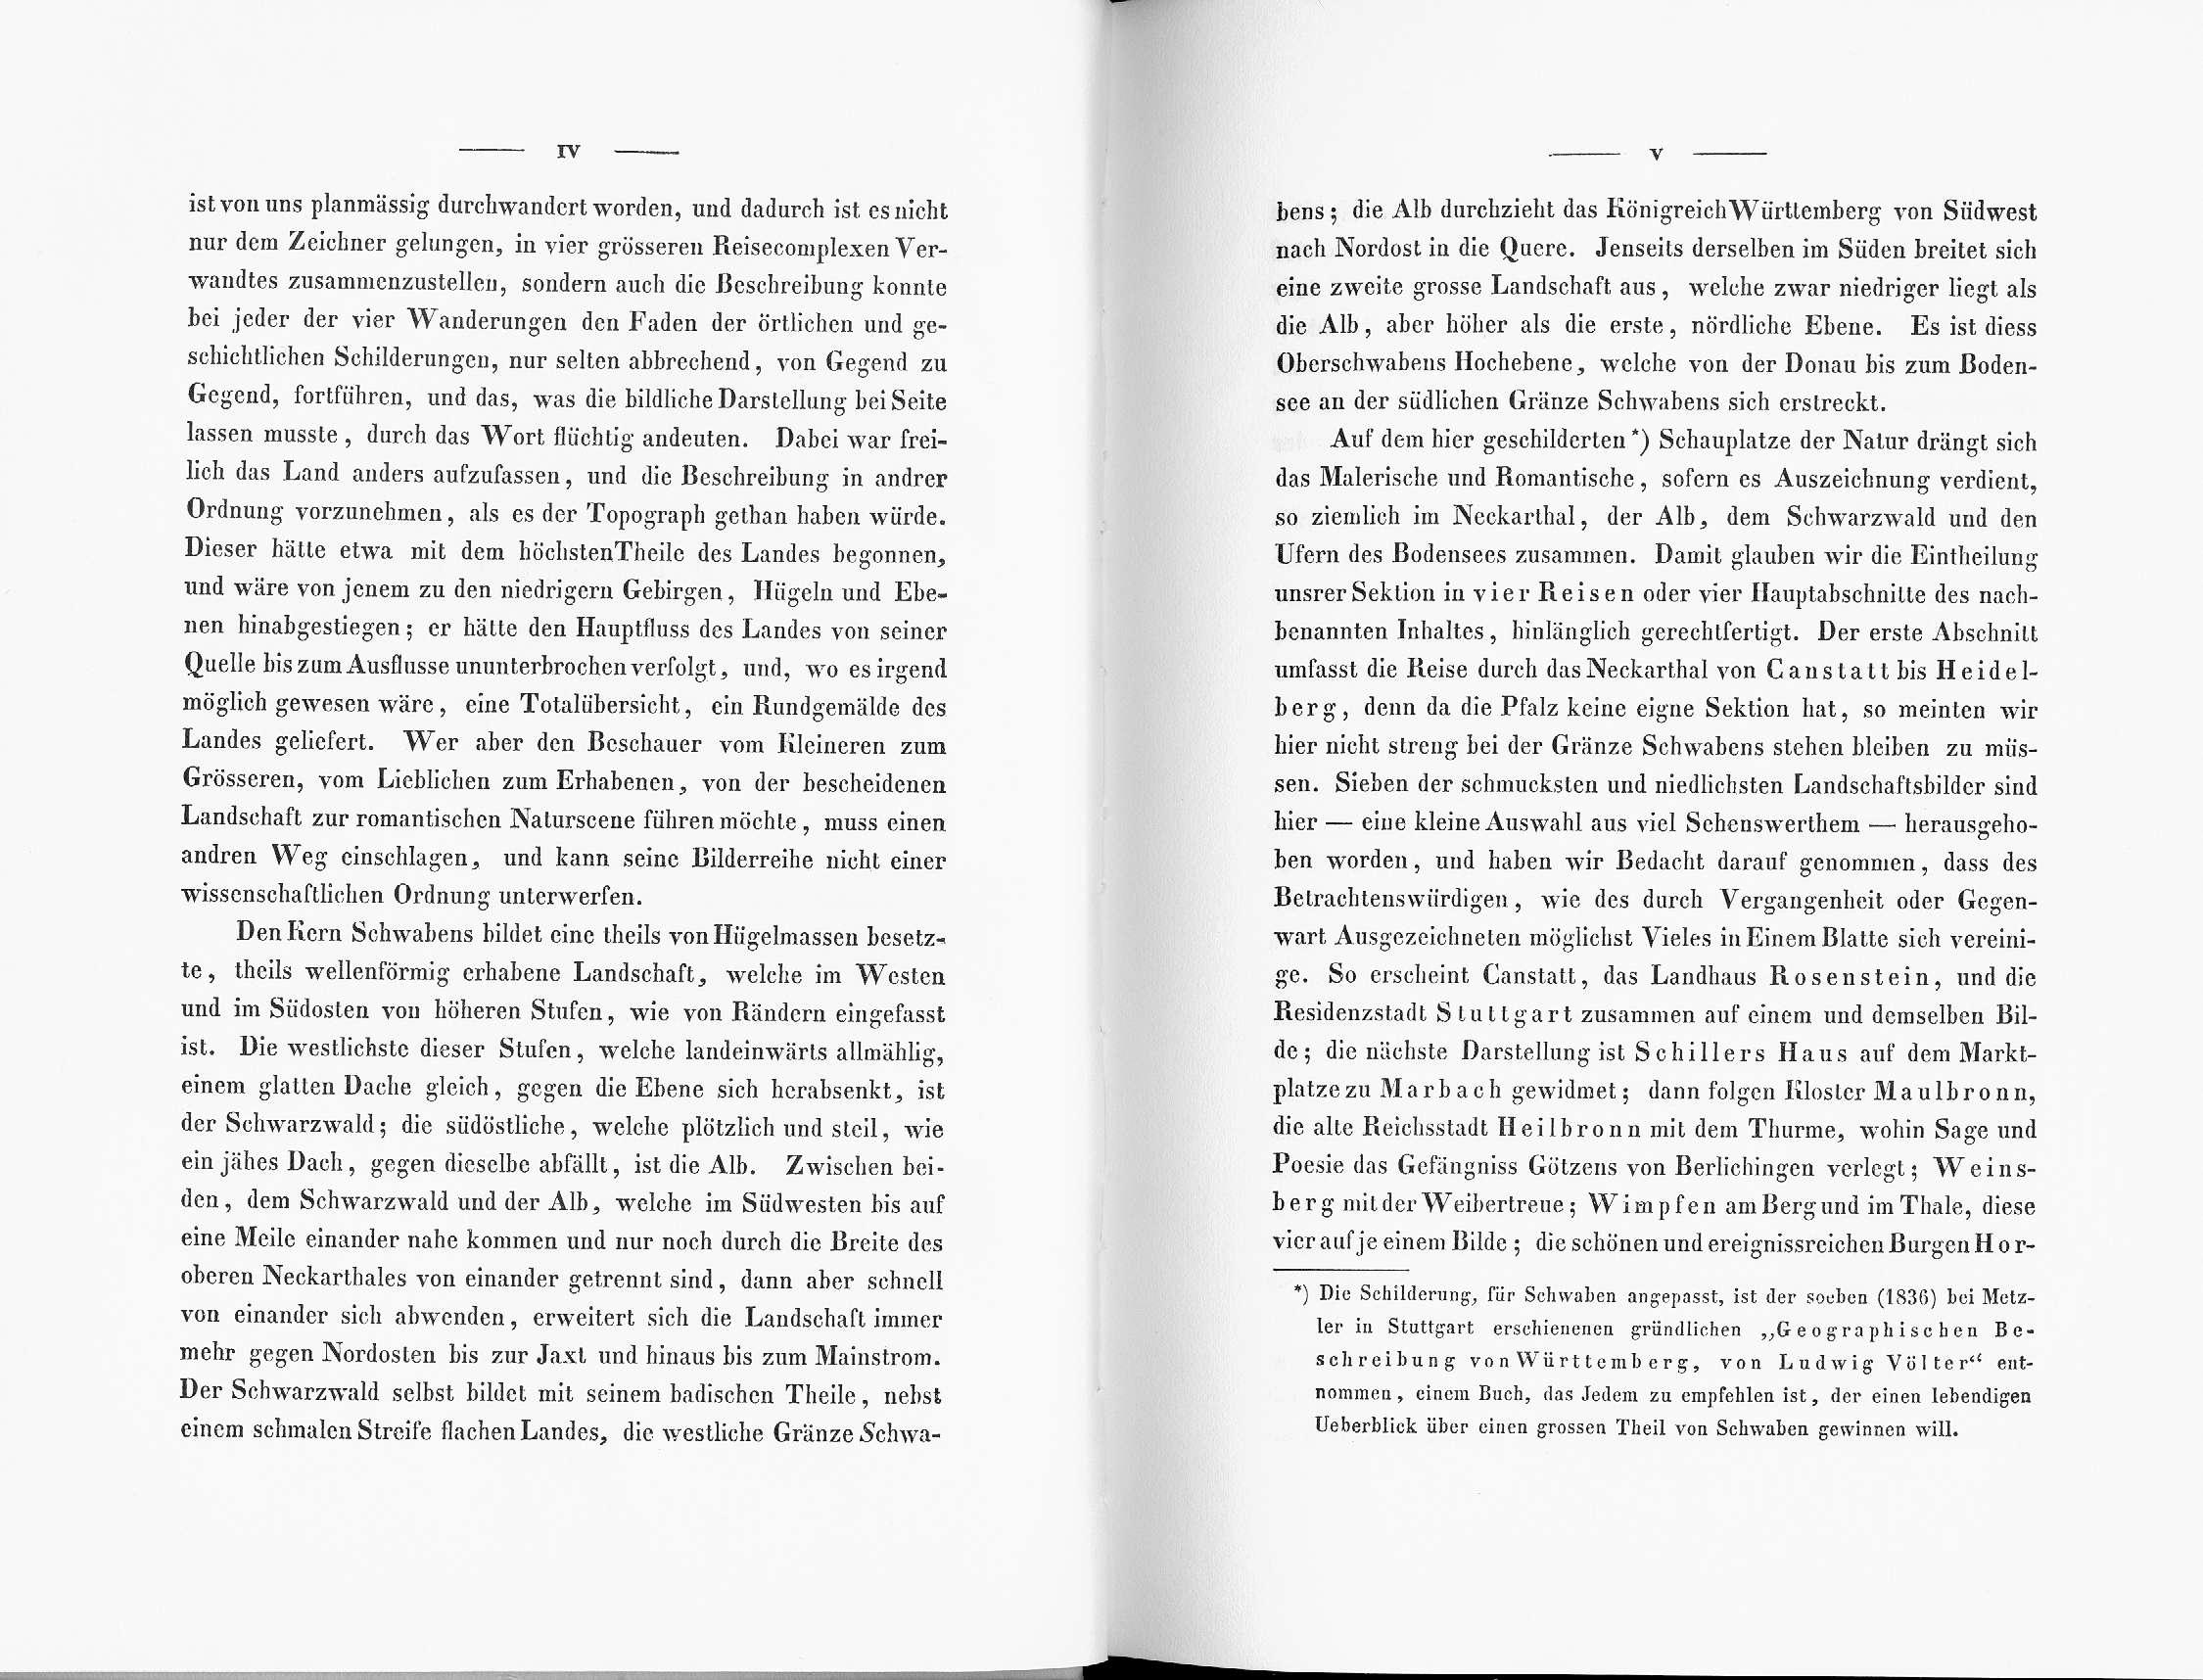 File:De Wanderungen Durch Schwaben (Schwab) 004